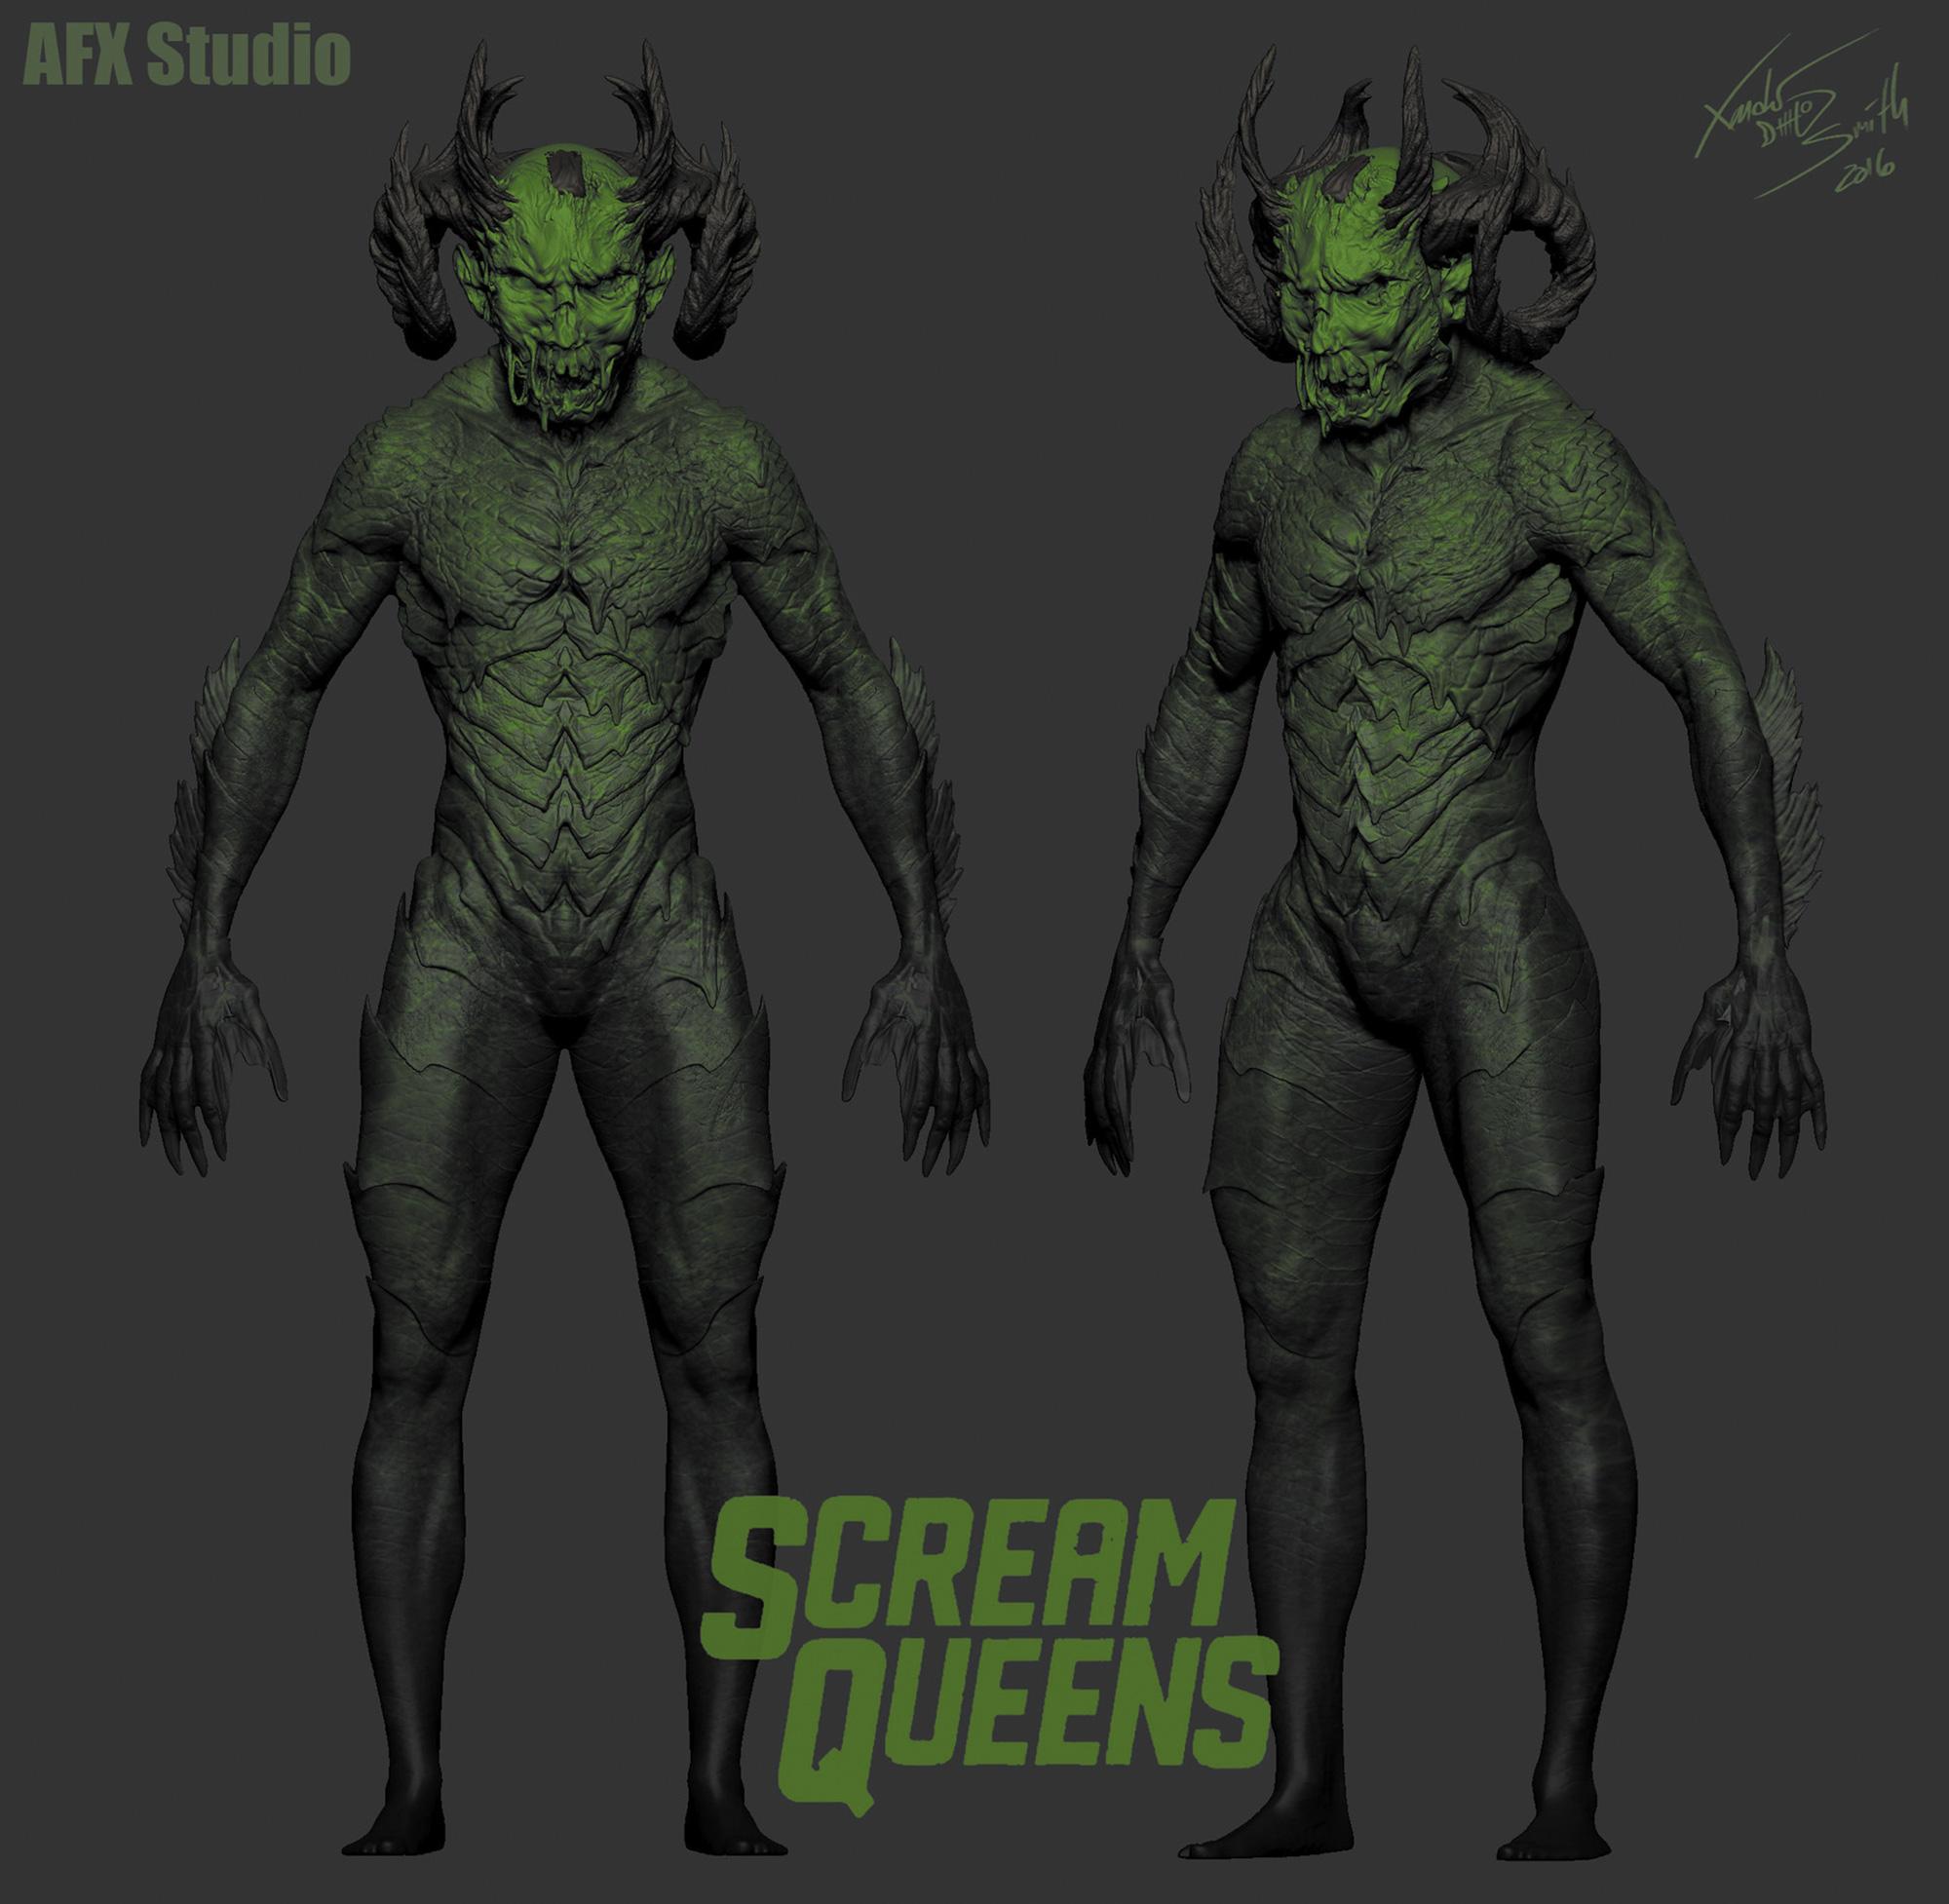 ScreamQueens_CostumeIllustration01__Artopsy_XanderSmith_Birdy092_KrystiJomei